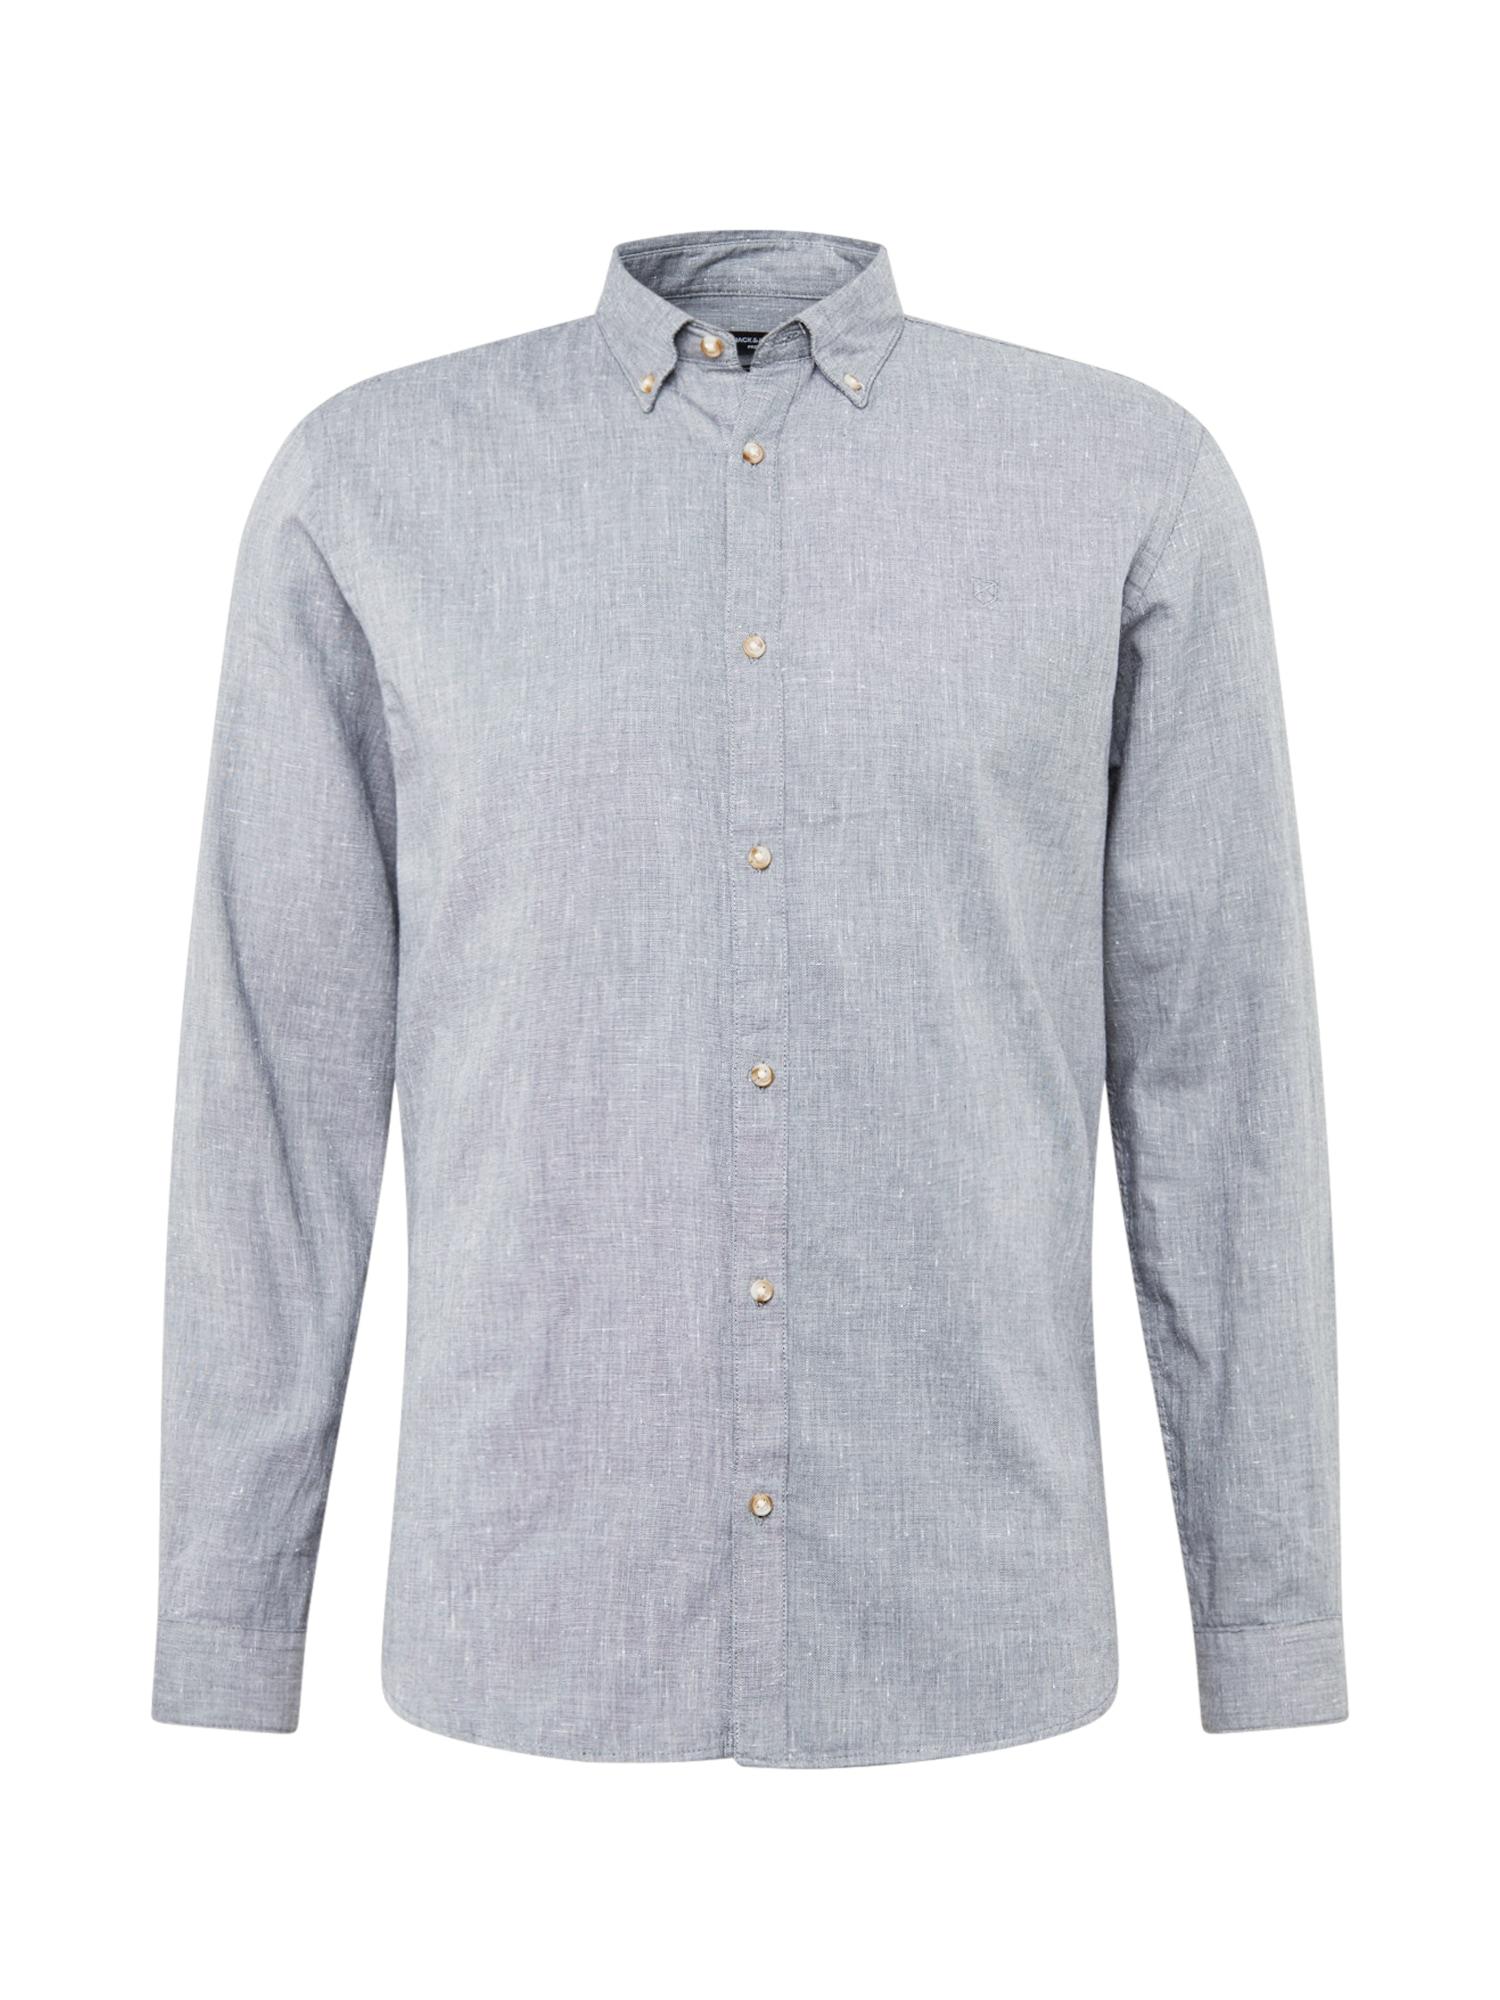 JACK & JONES Marškiniai pilka